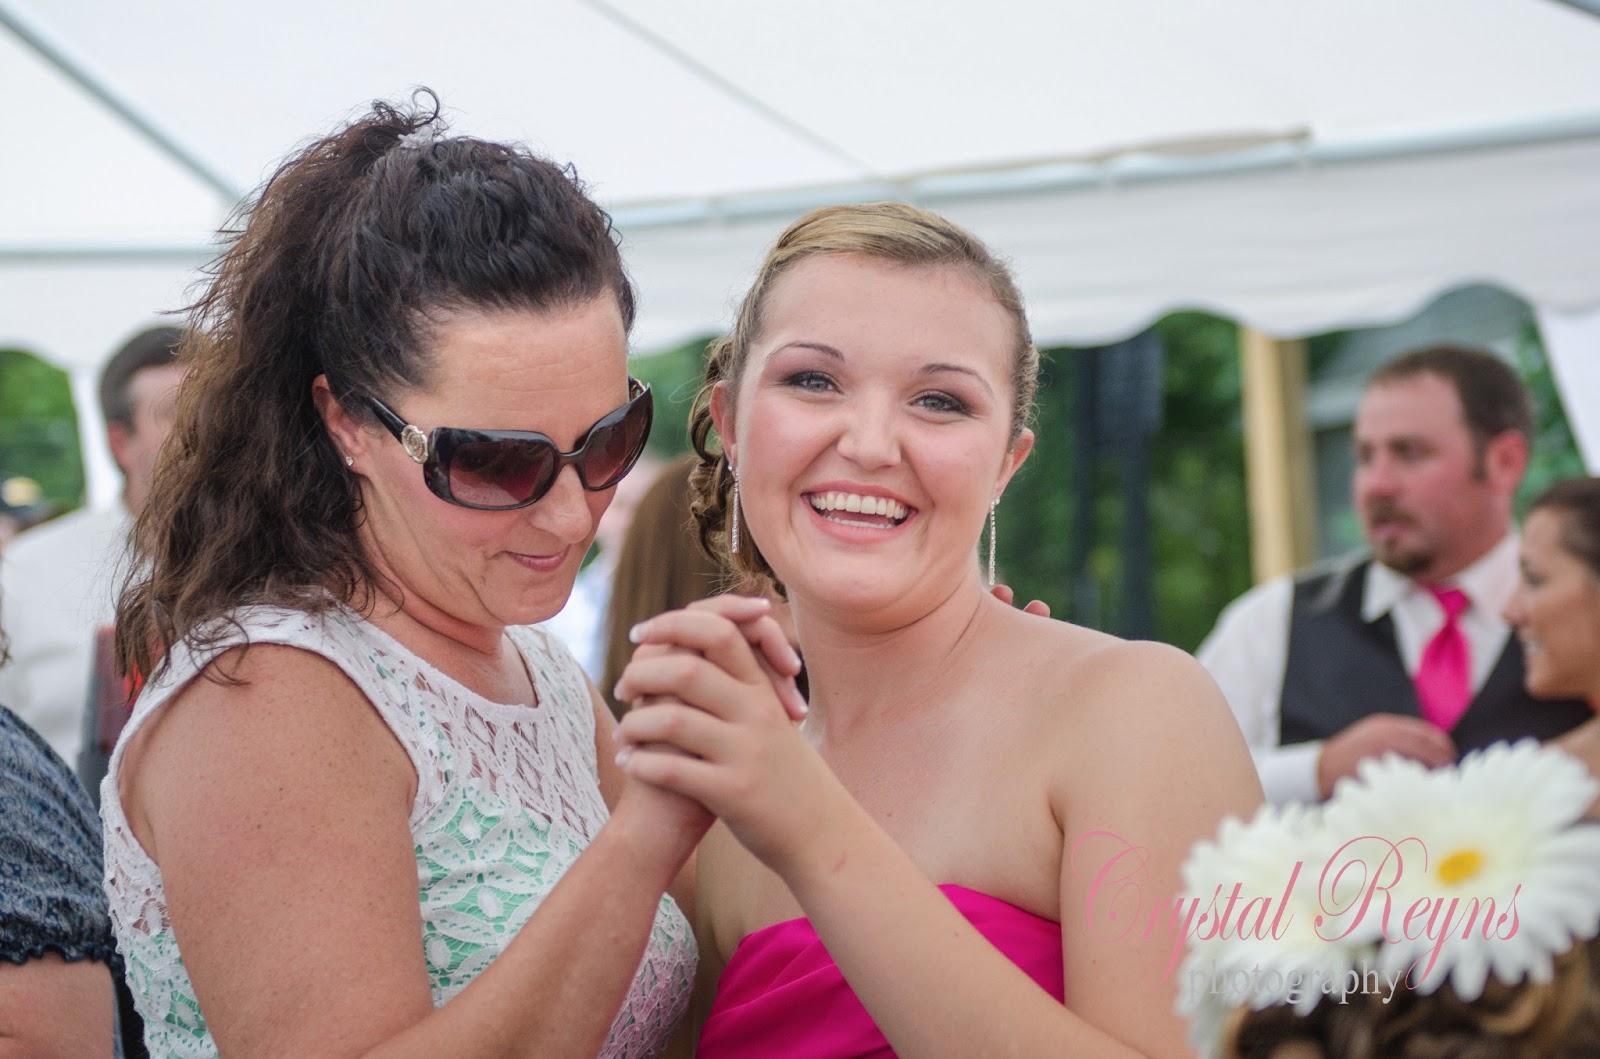 Crystal Reyns Photography Nikki Amp Jamie Married 6 8 13 L